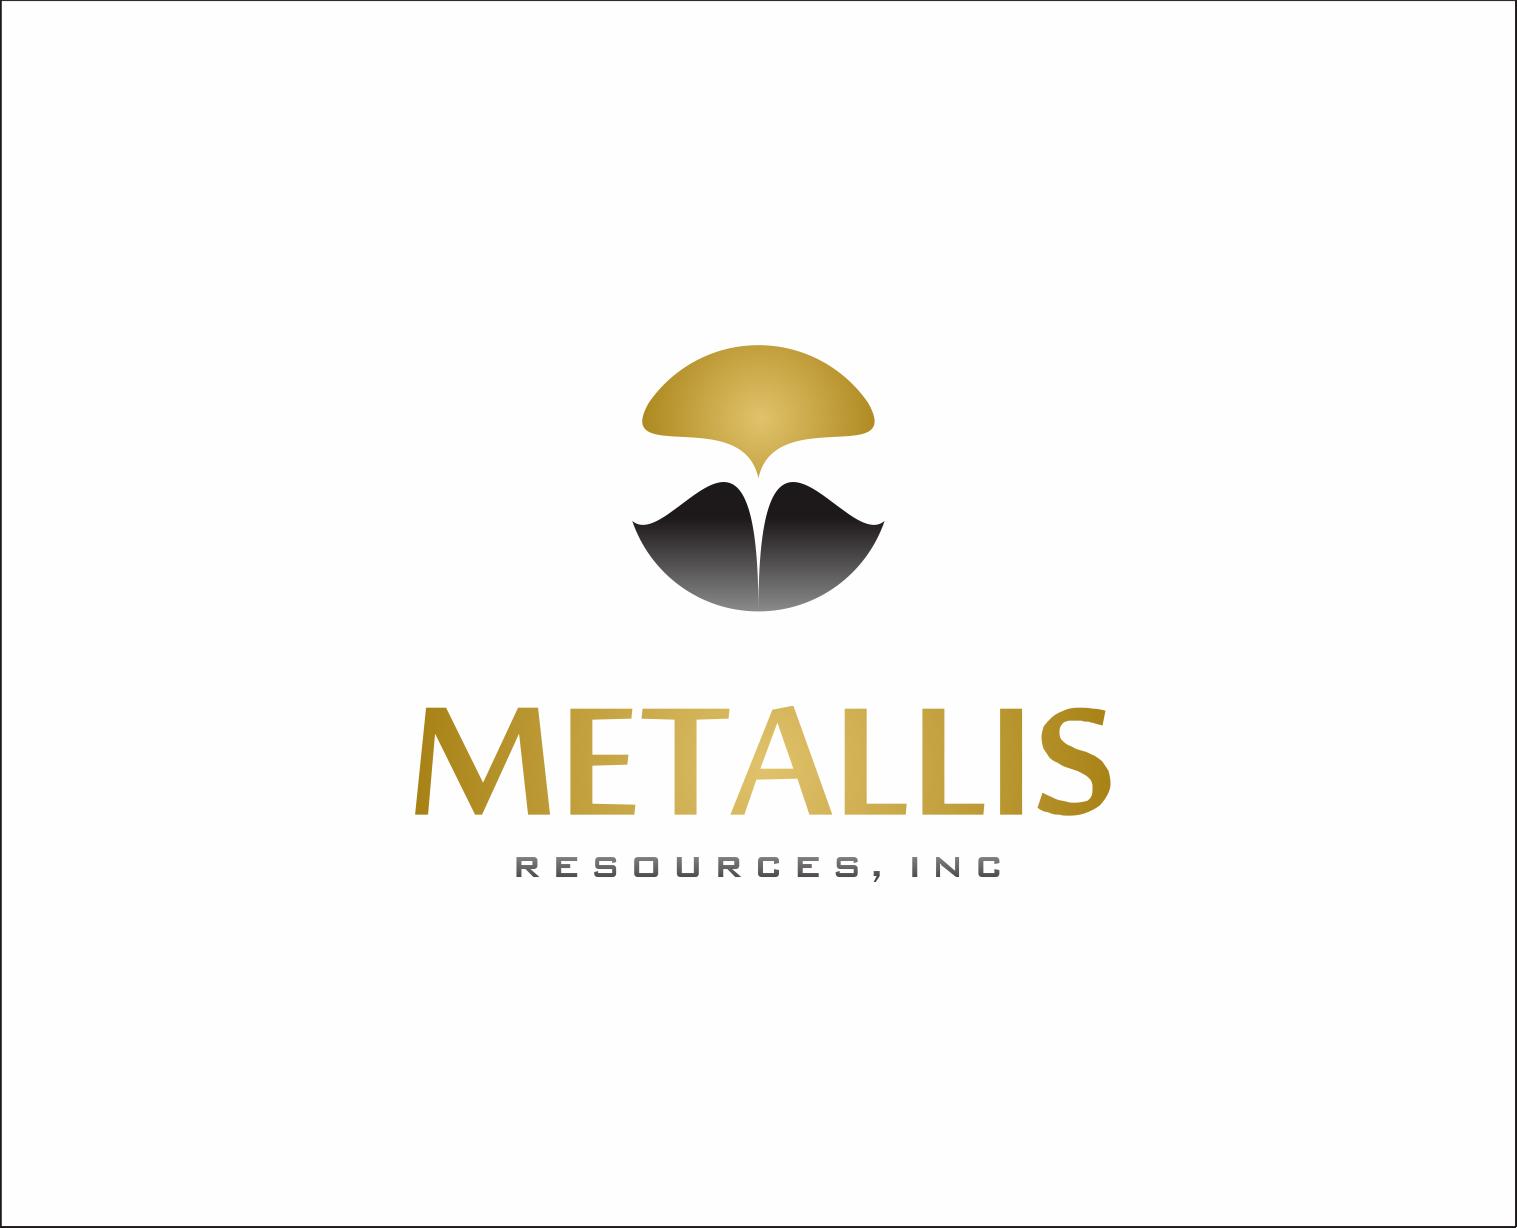 Logo Design by Armada Jamaluddin - Entry No. 141 in the Logo Design Contest Metallis Resources Inc Logo Design.